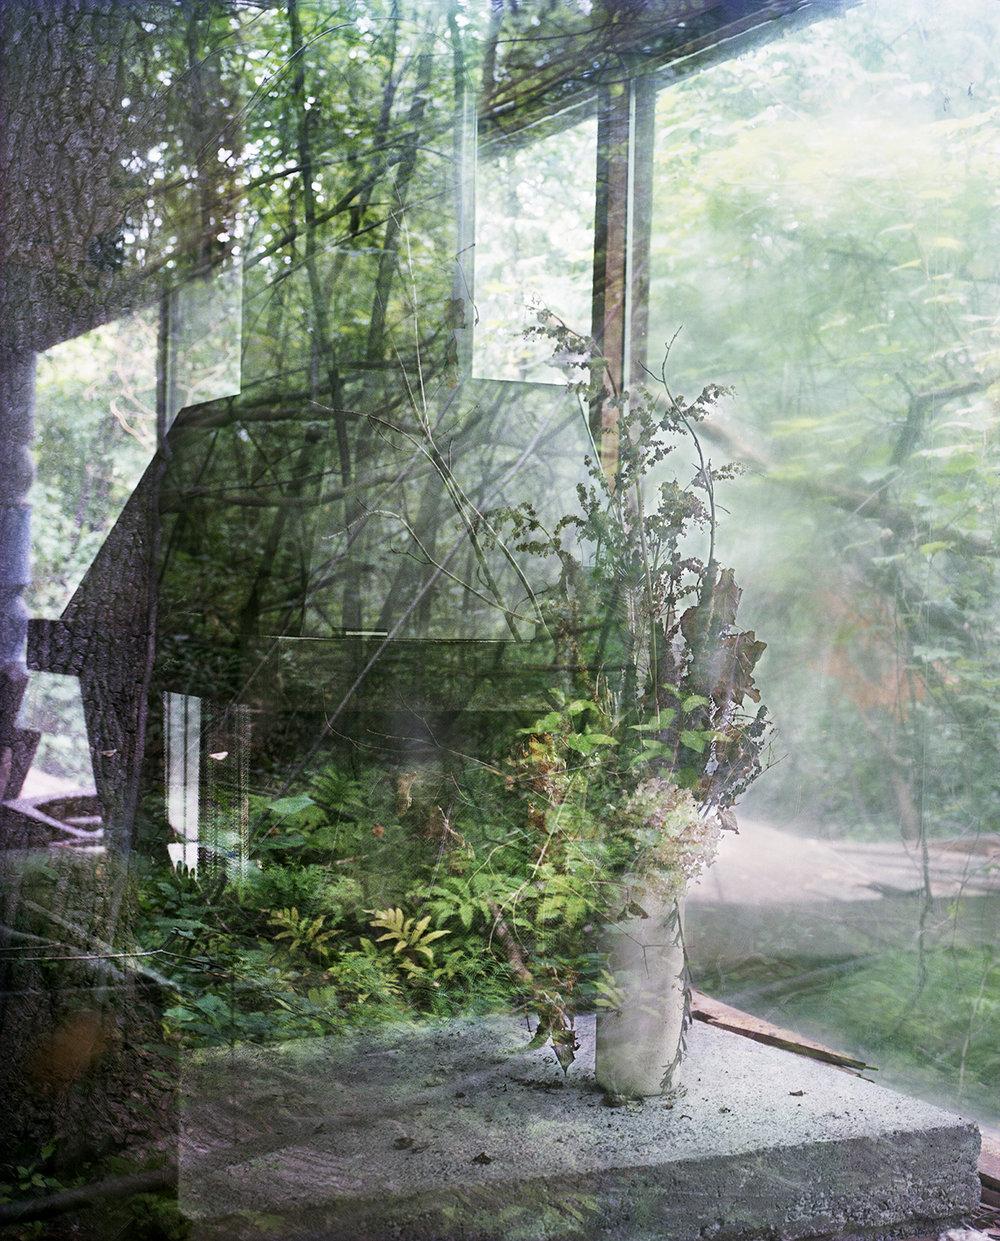 "Lorna Bauer,  A Time Capsule, a True Abode 1,  2017, impression jet d'encre,40"" x 32.2"" (102 x 81 cm)."